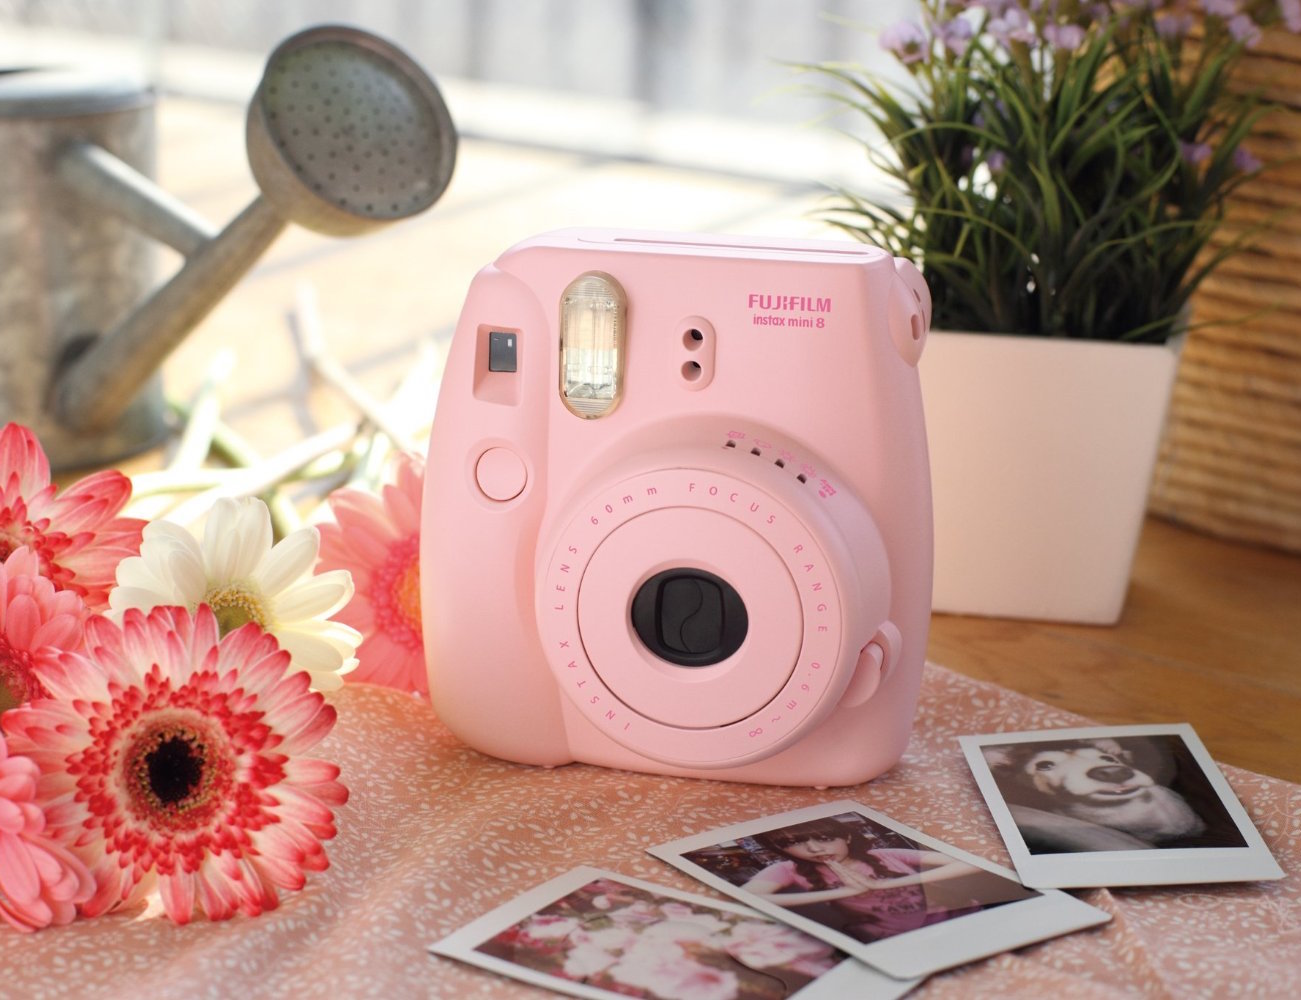 Fujifilm+INSTAX+Mini+8+Instant+Film+Camera